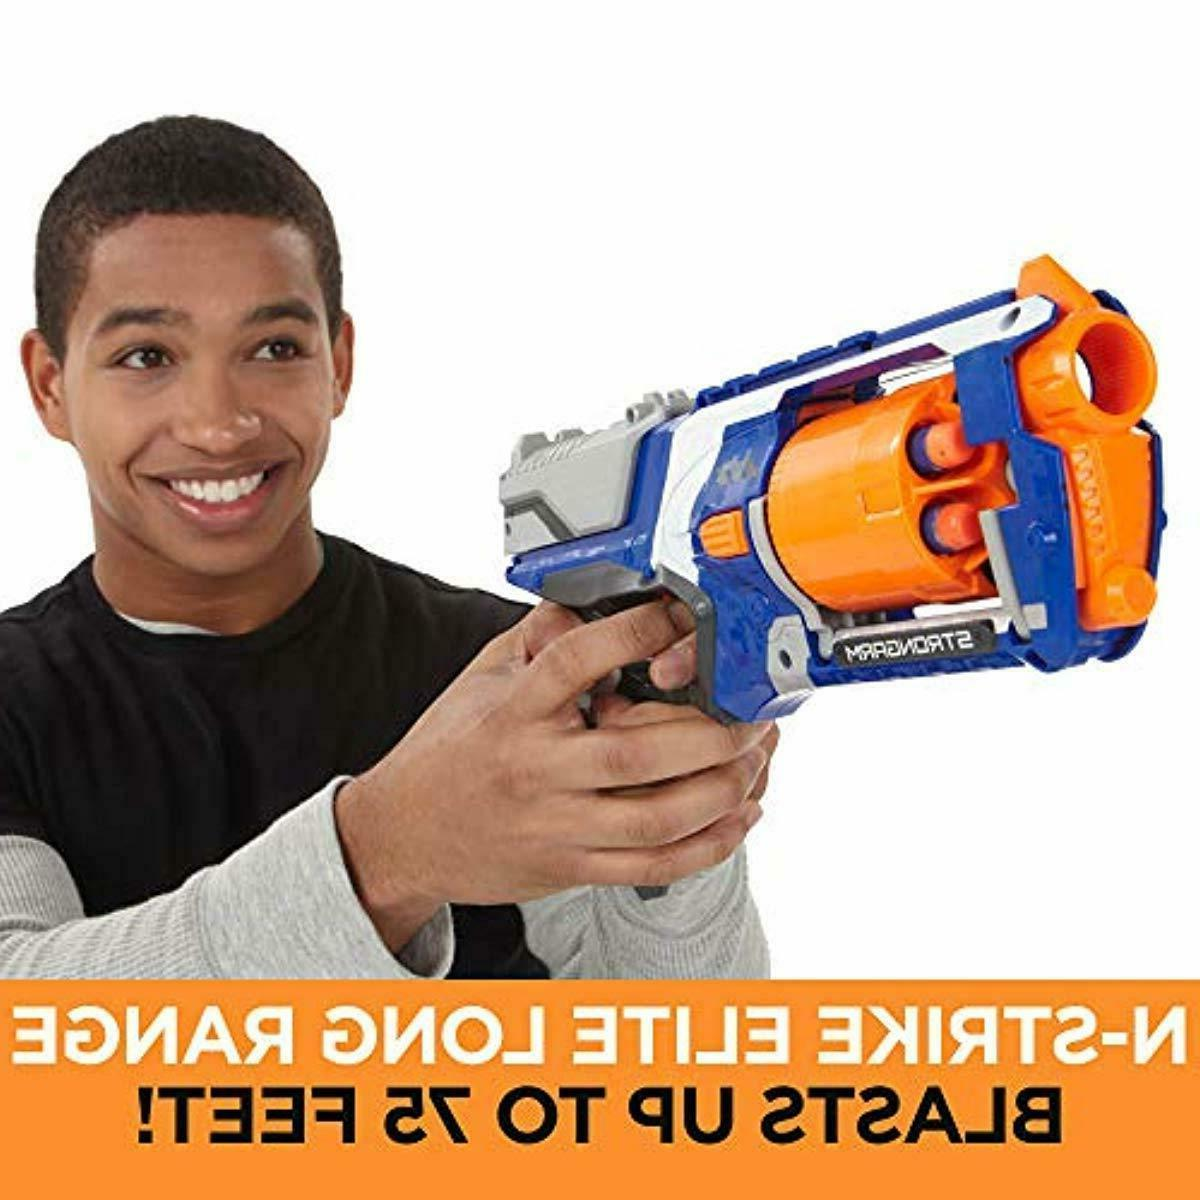 Nerf Guns Boys 6 7 11 12 9year Old